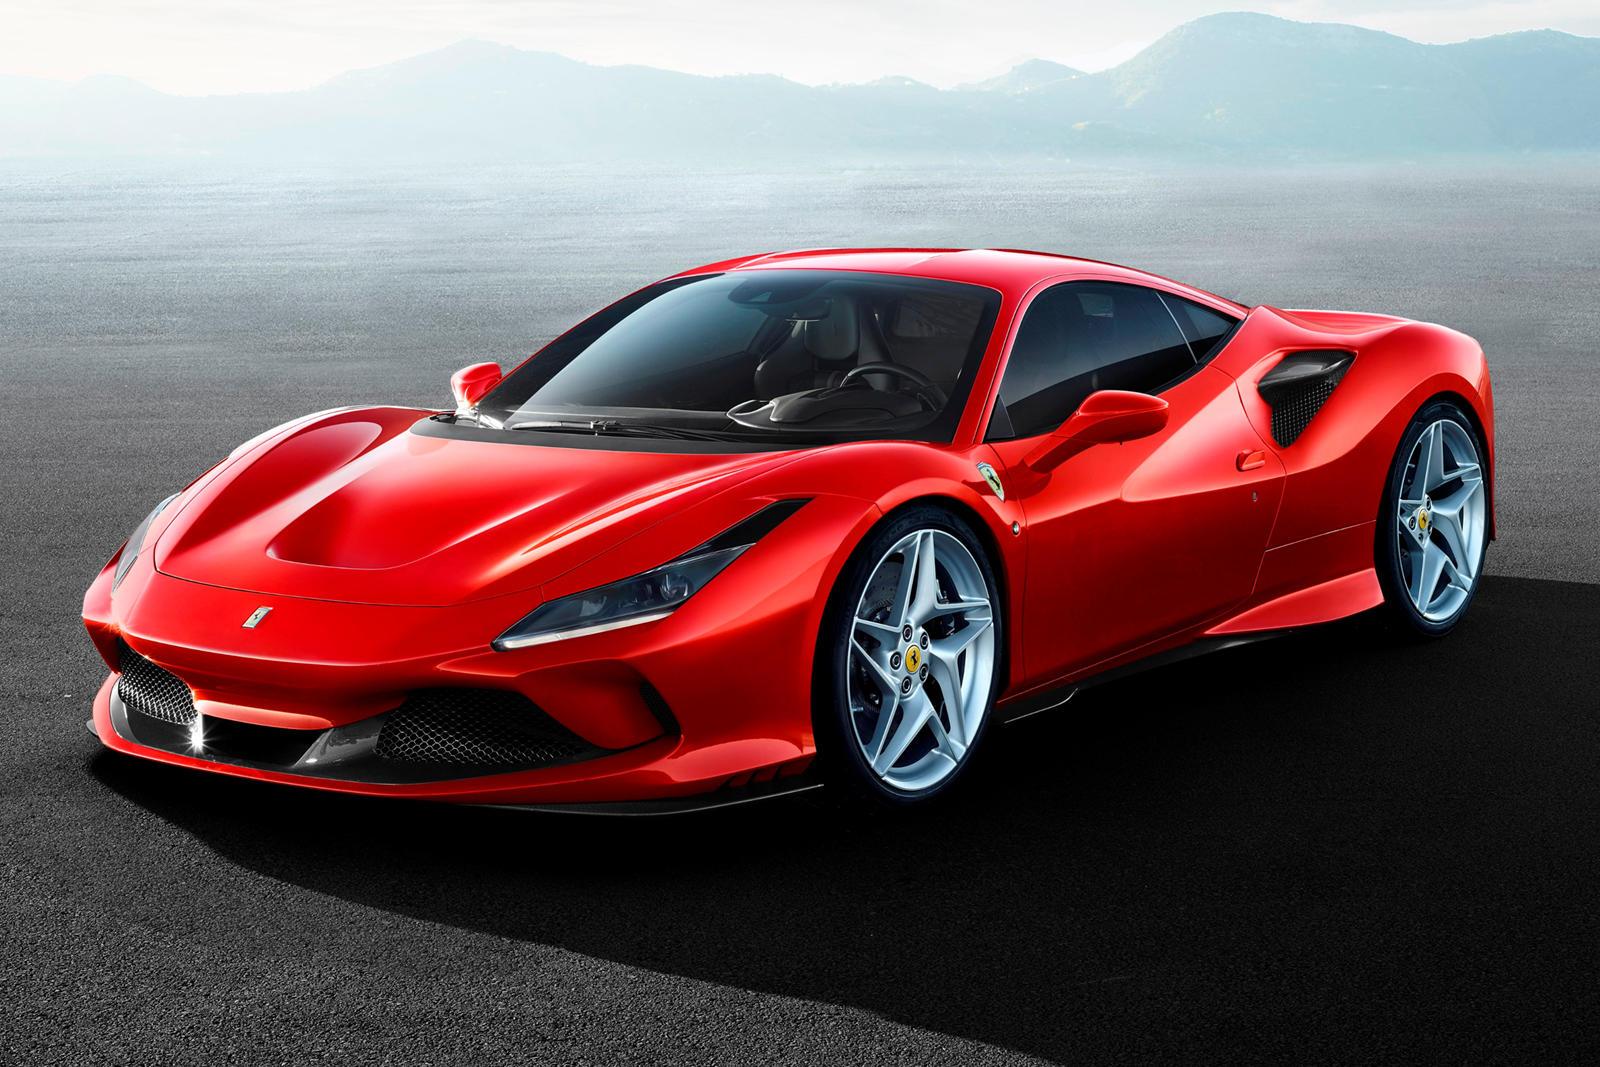 Wish Galactictechtips Xyz الصور والأفكار حول Ferrari Car 2020 Models